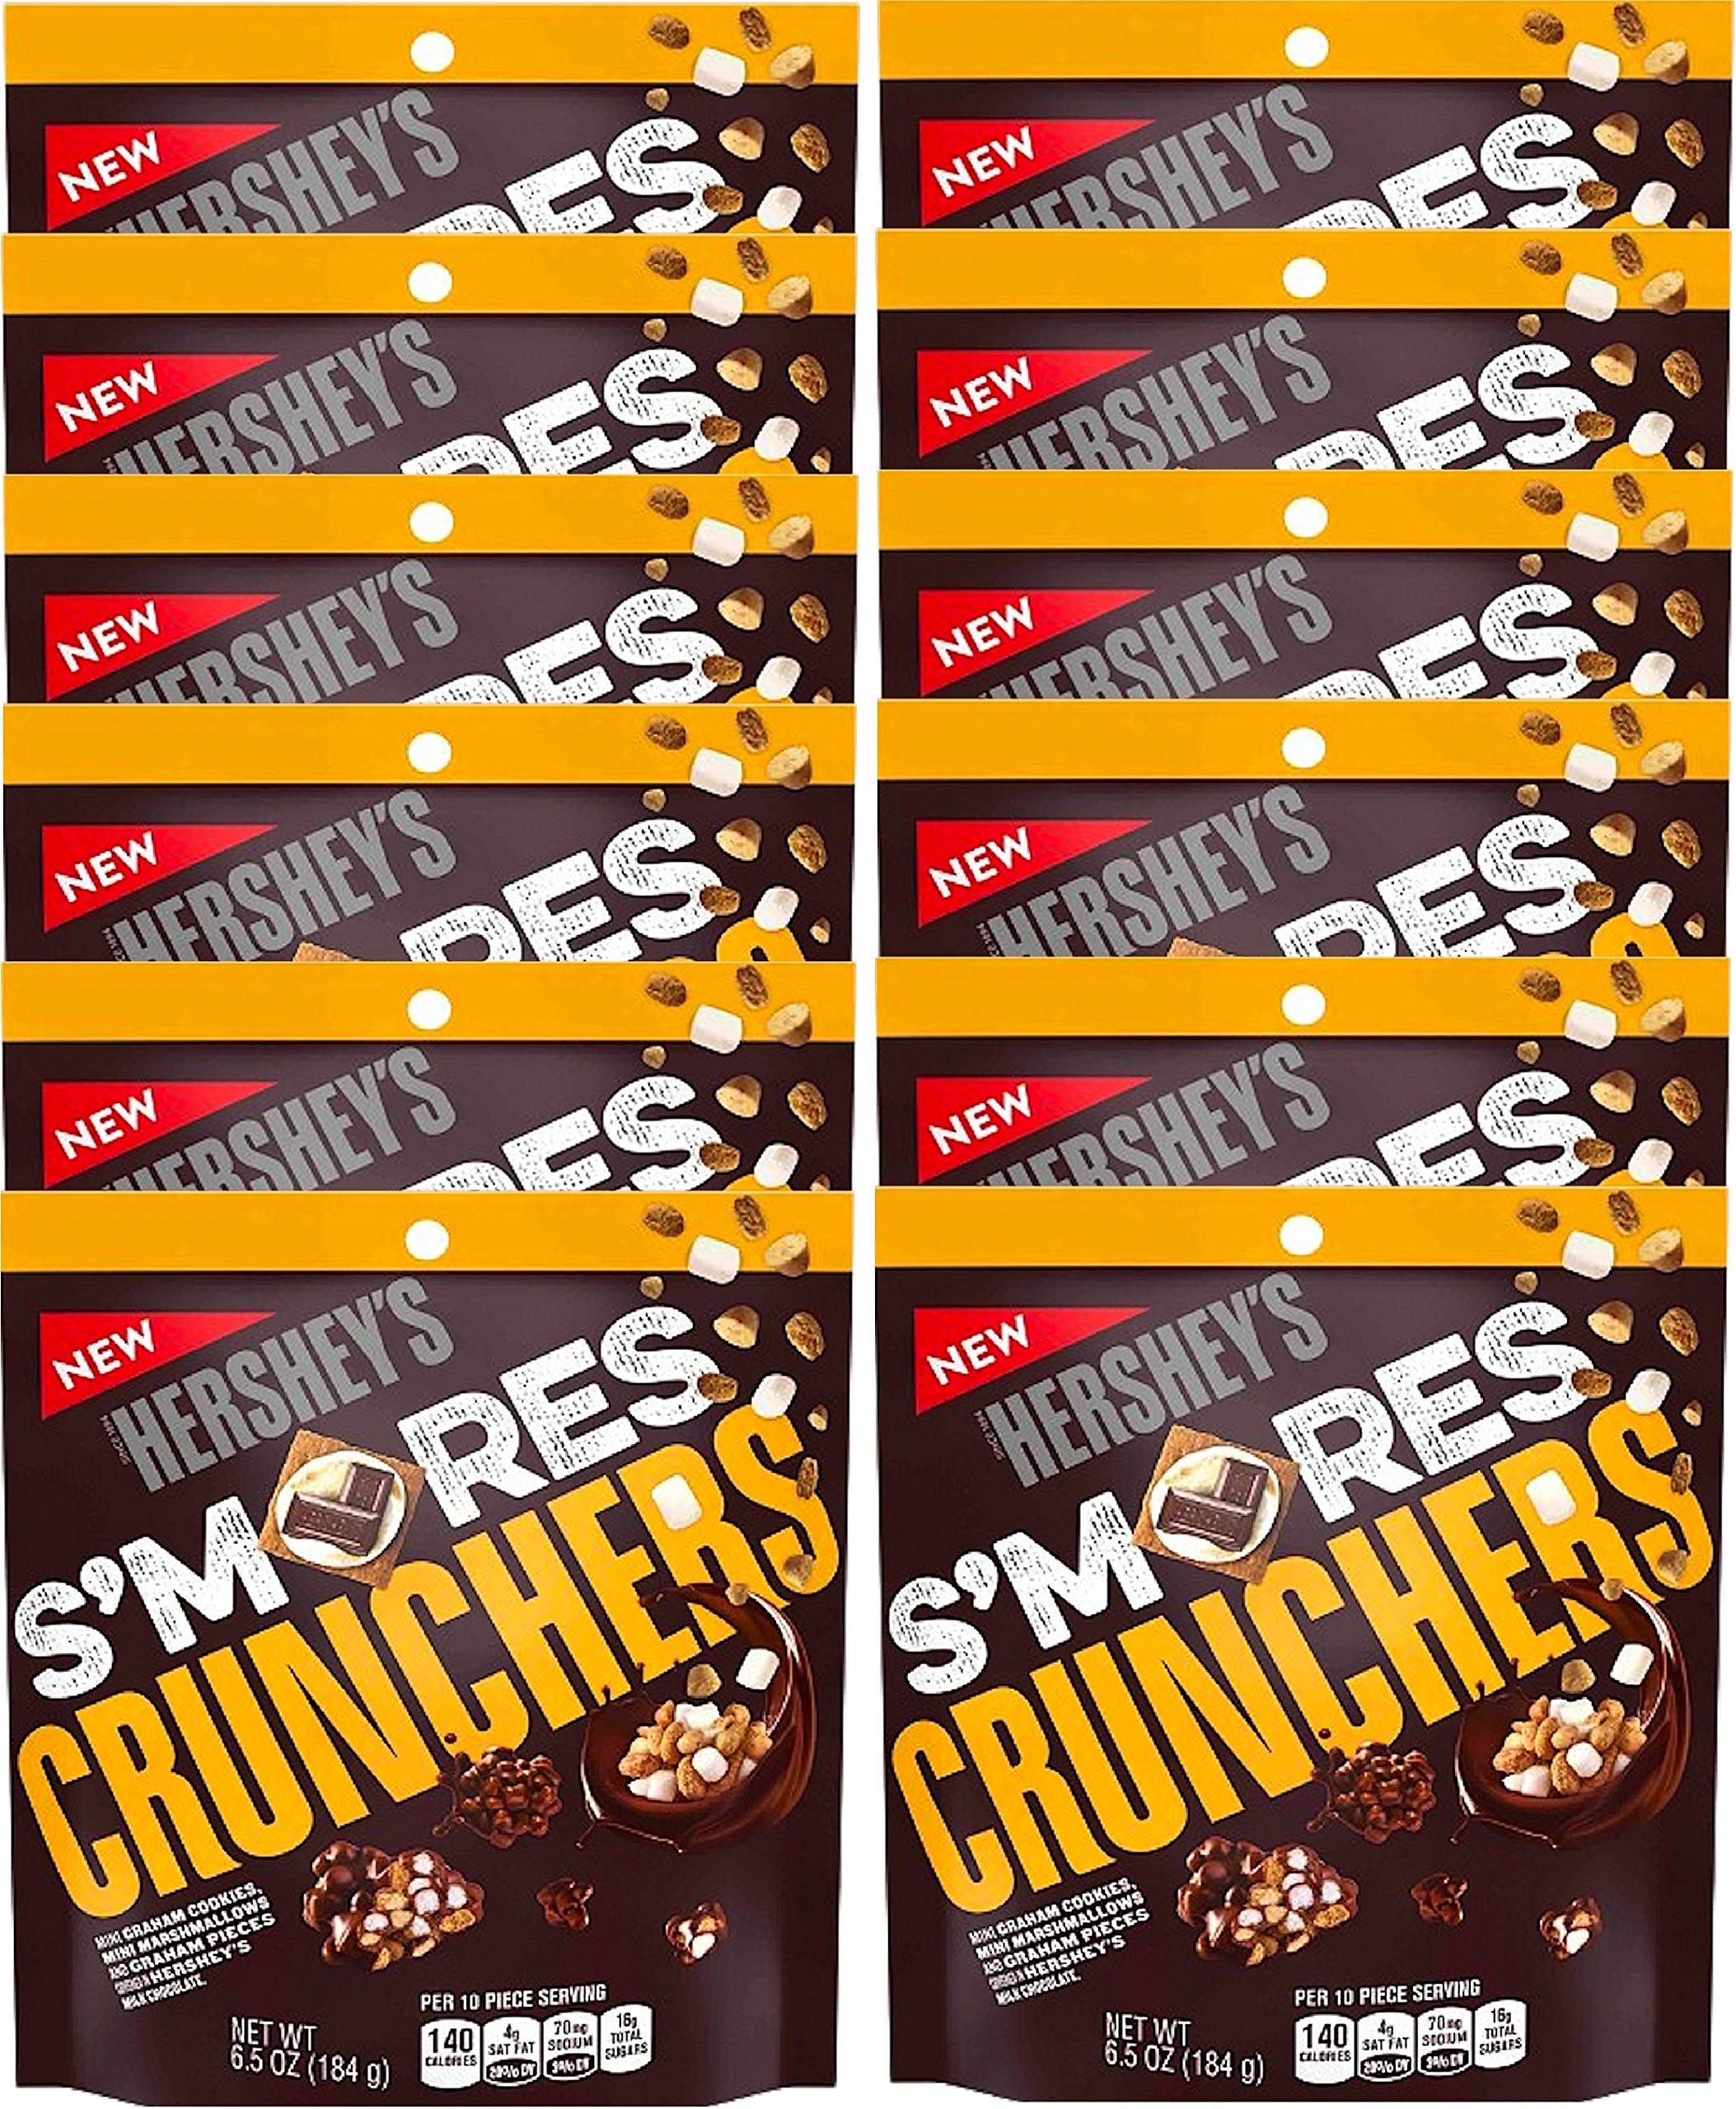 NEW Hershey's S'mores Crunchers Mini Graham Cookies Mini Marshmallows Covered In Hershey's Chocolate Heaven- 6.5oz (12)